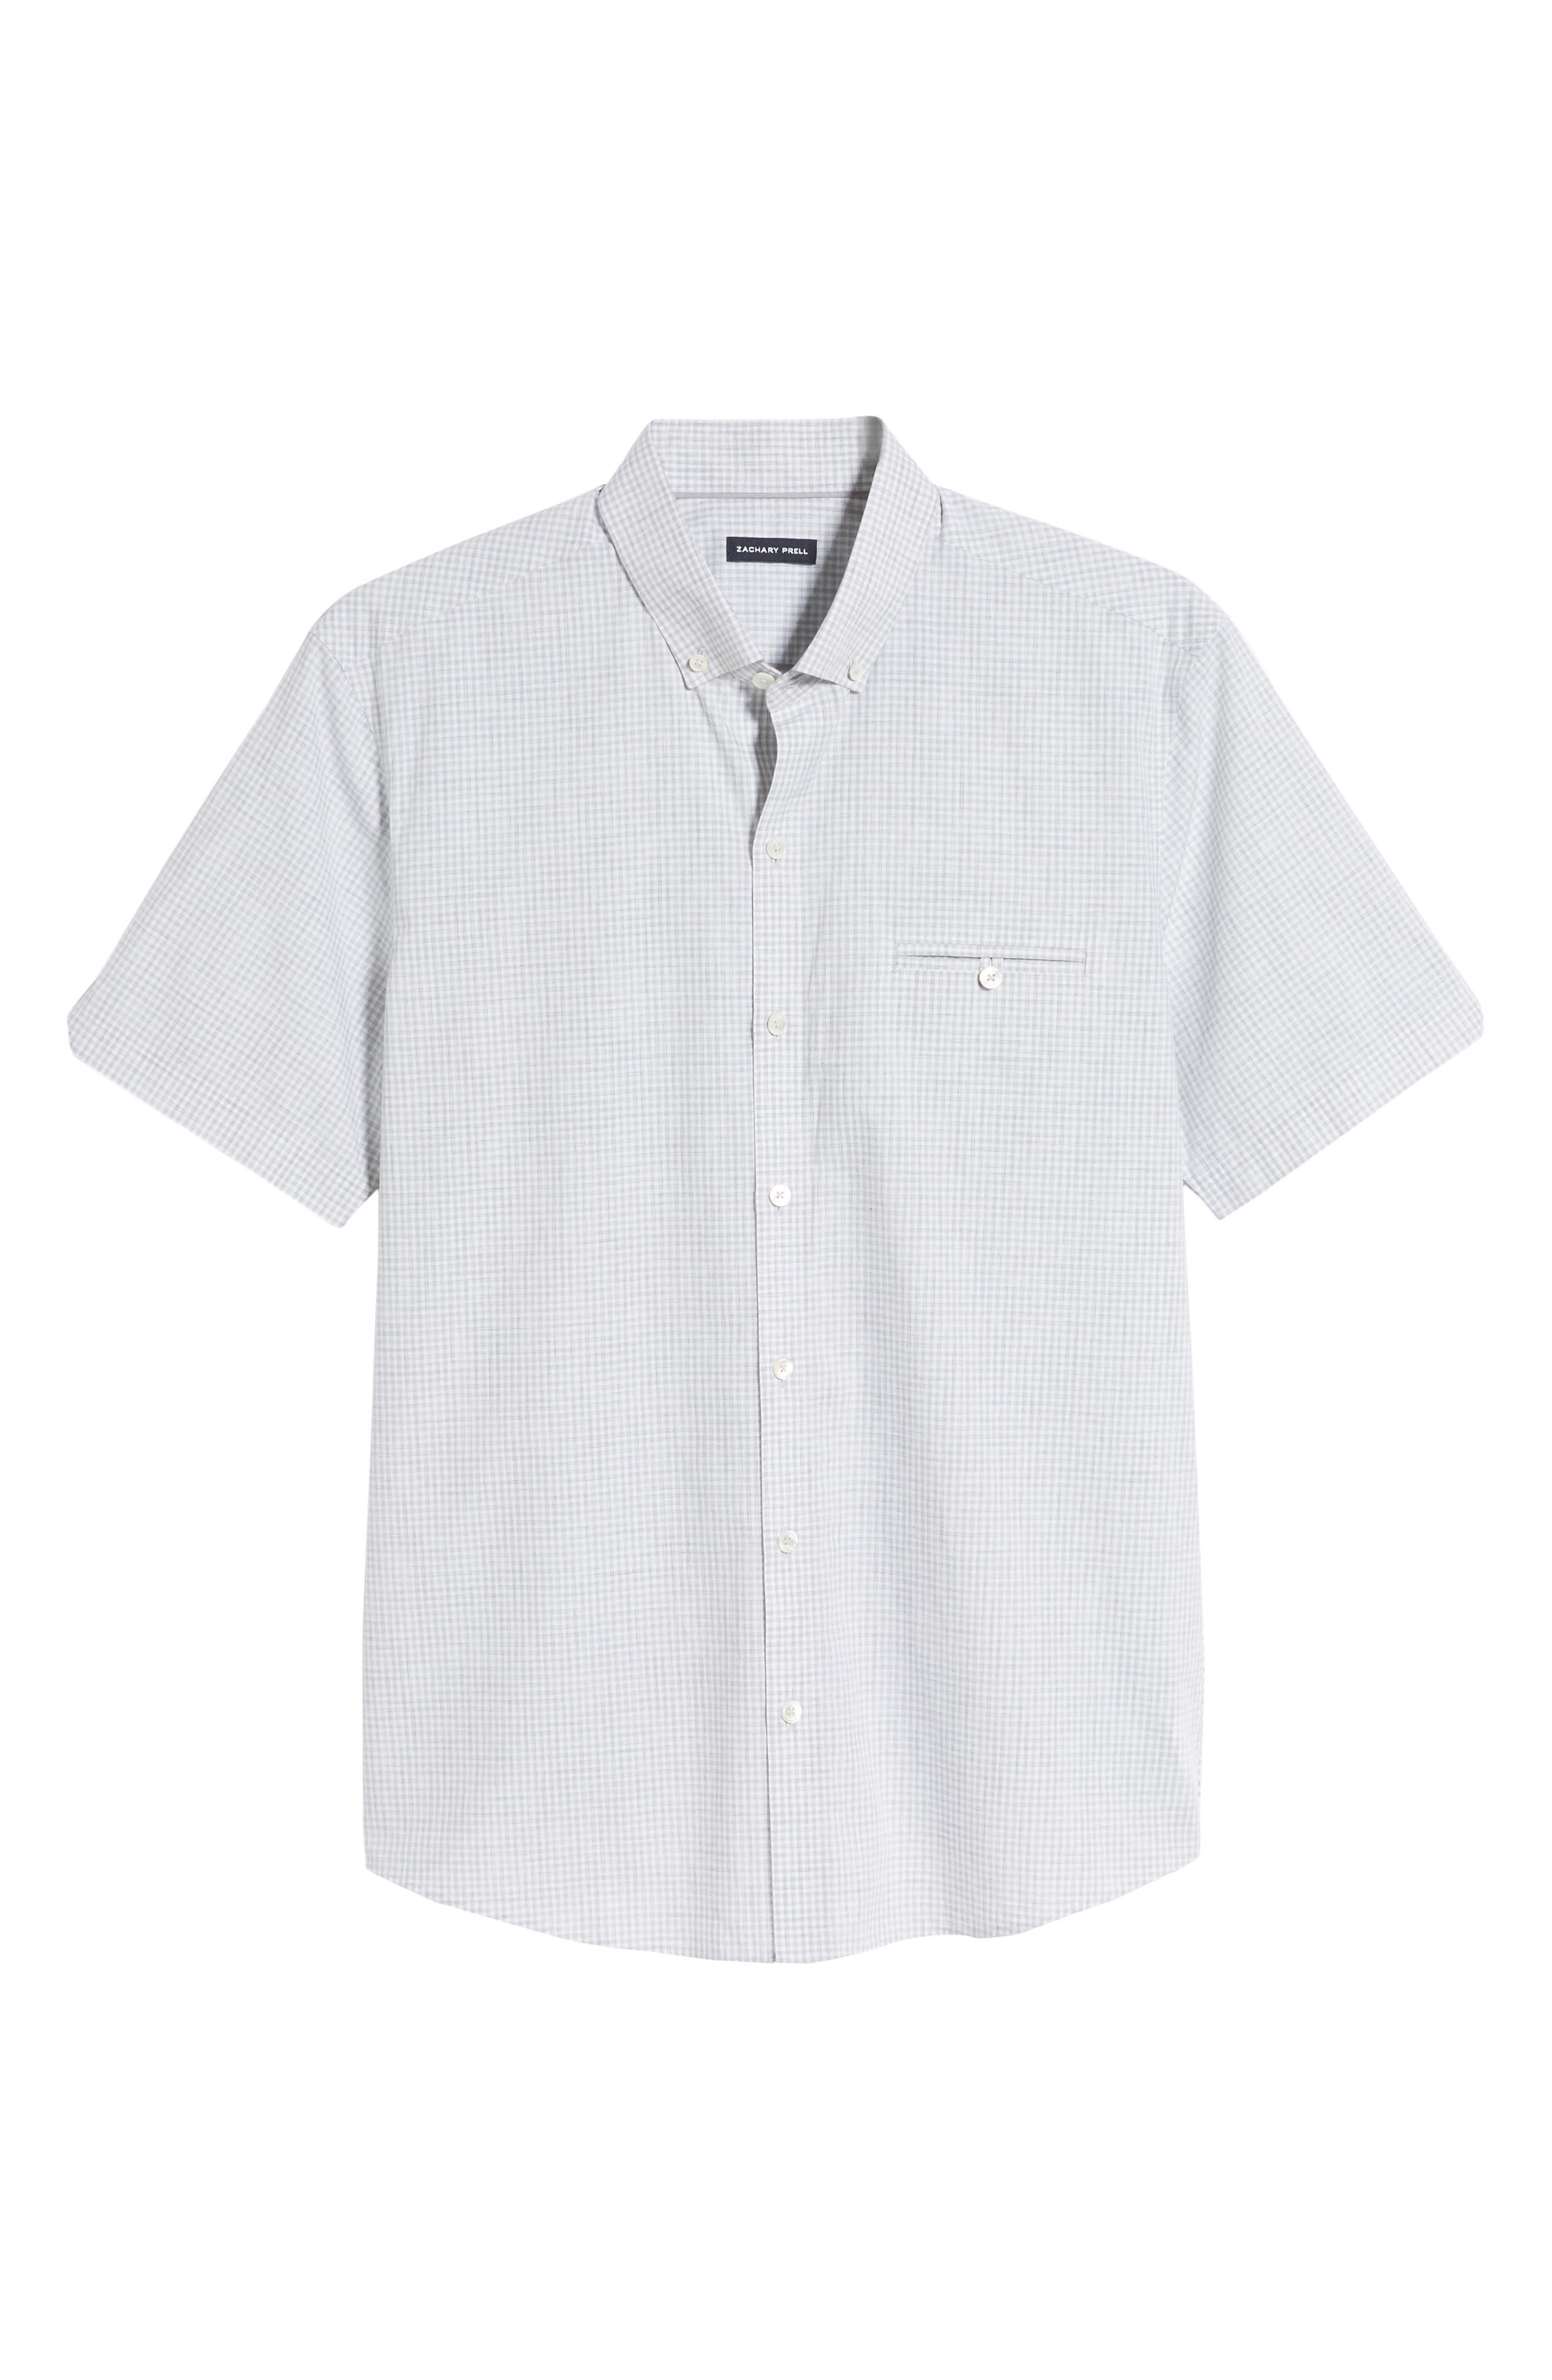 ZACHARY PRELL, Cechini Regular Fit Short Sleeve Sport Shirt, Alternate thumbnail 5, color, LT GREY